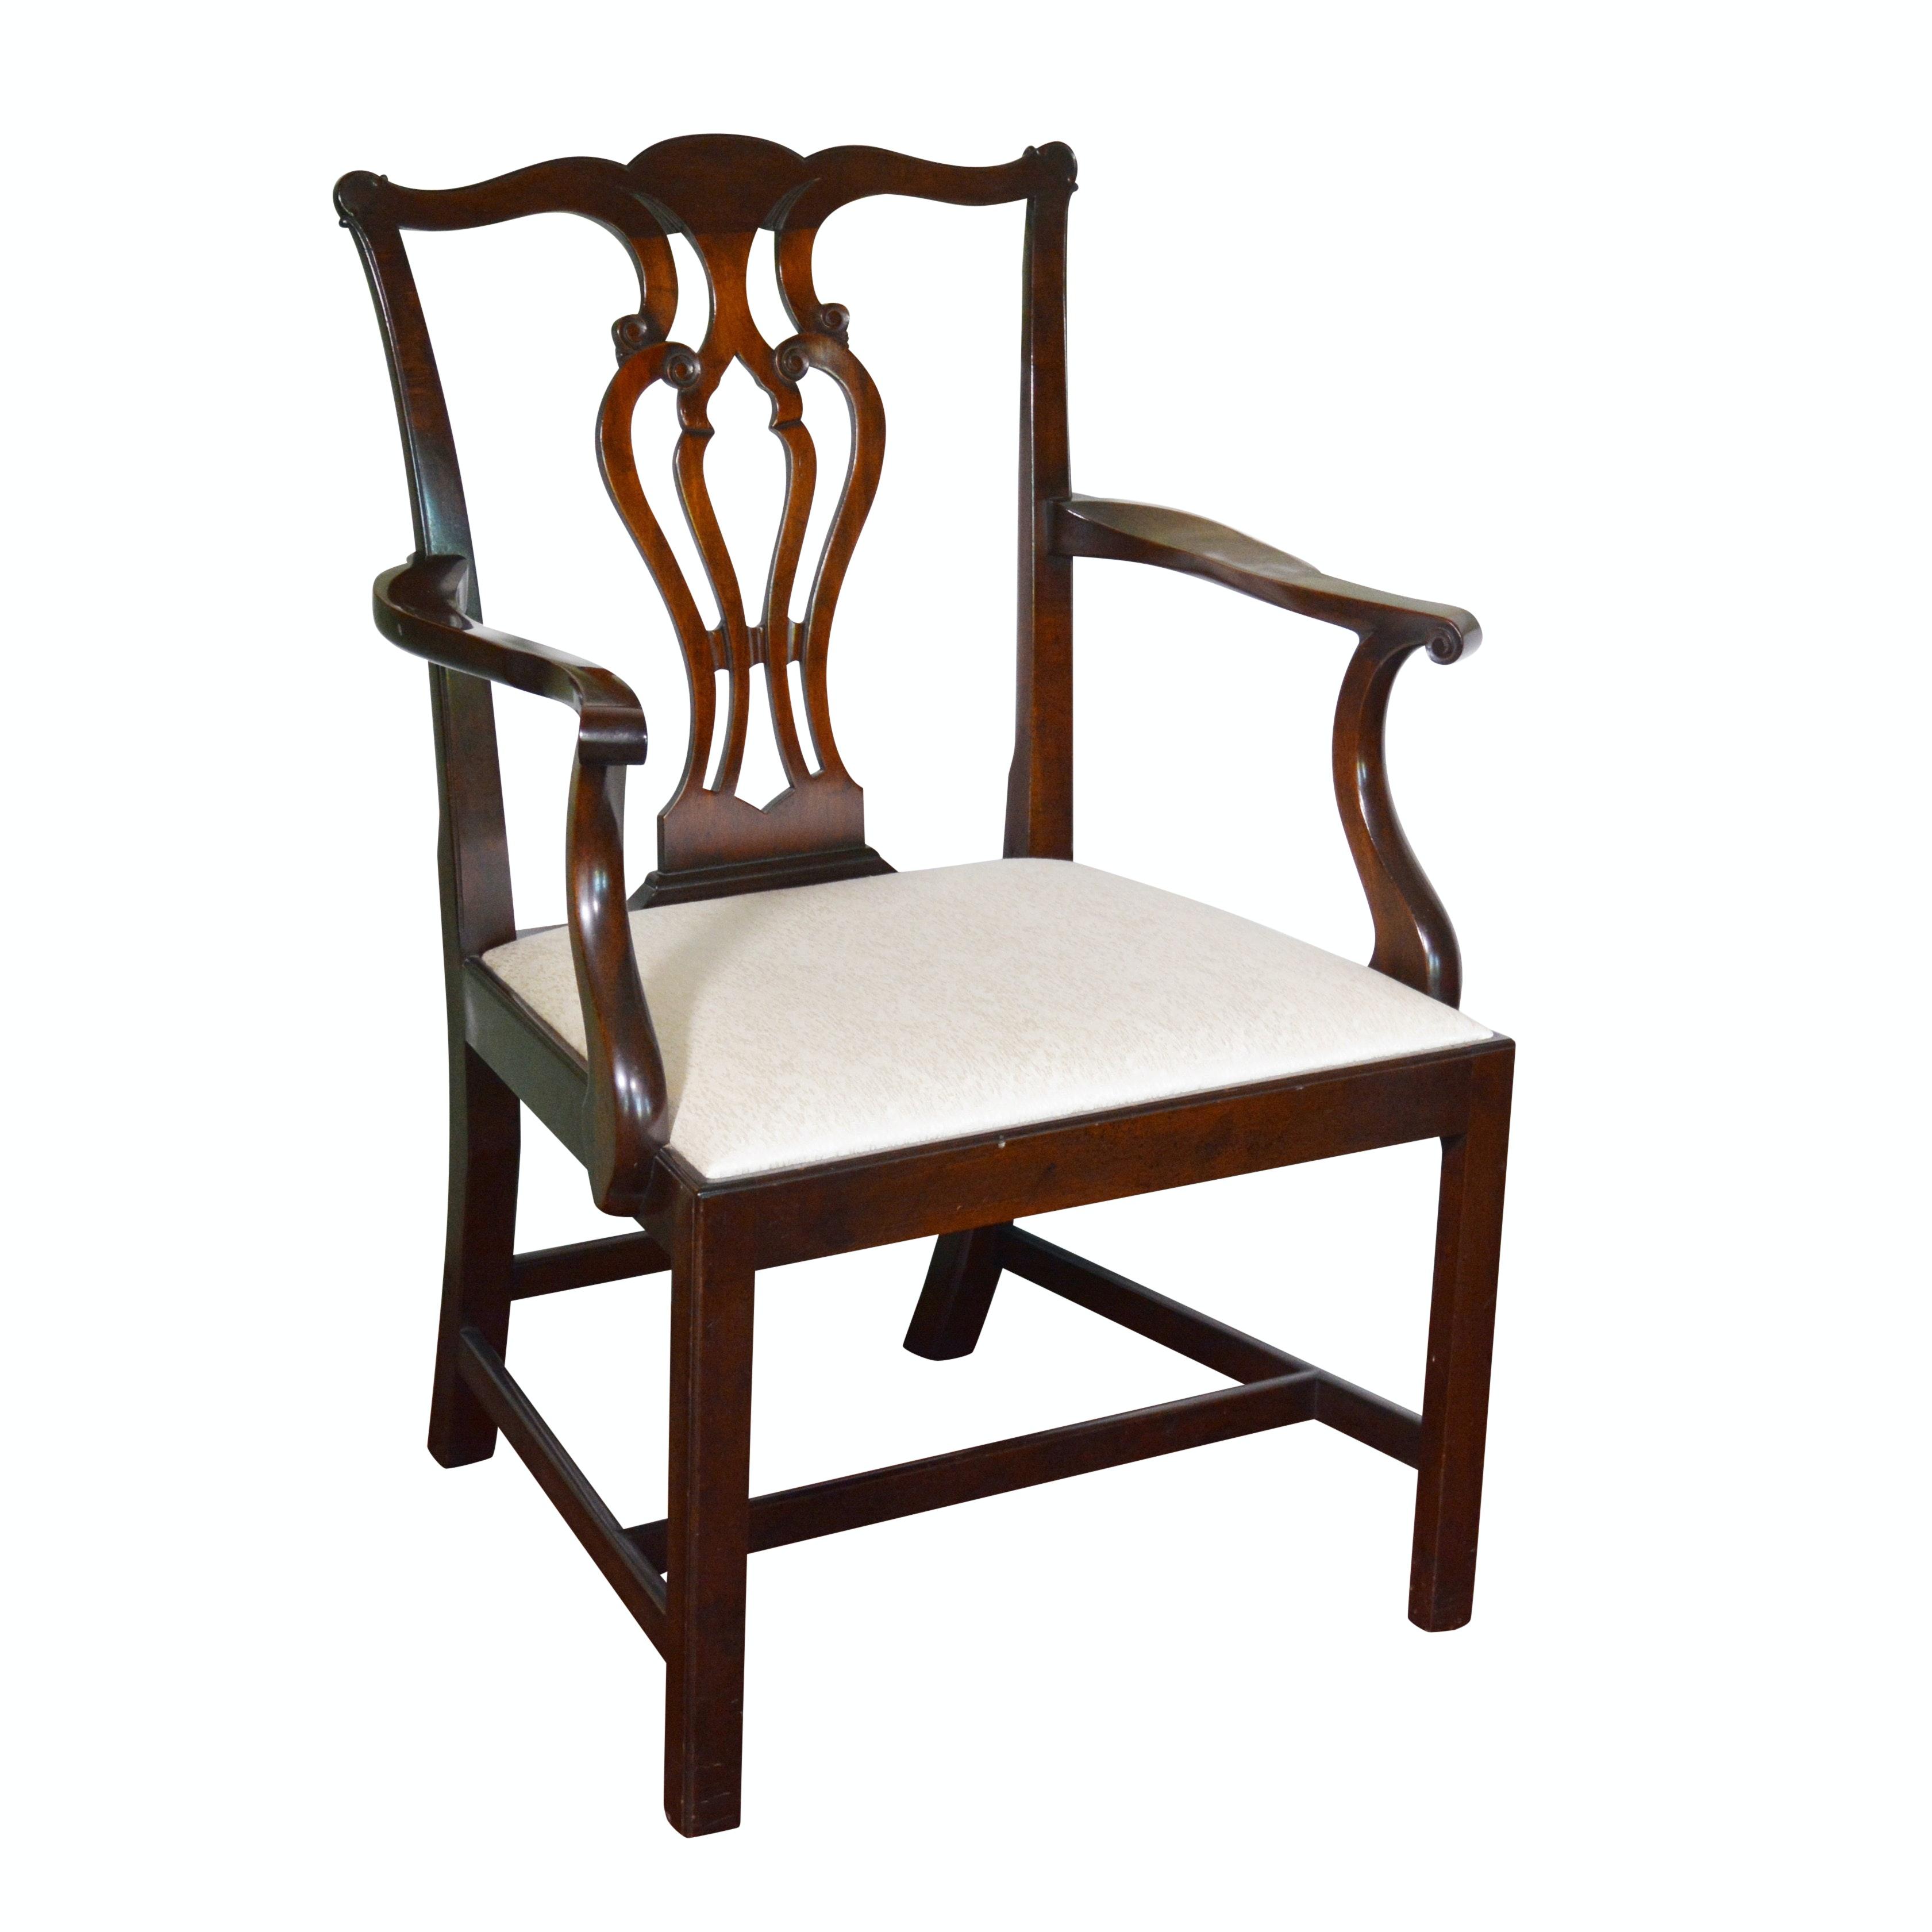 George III Style Mahogany Open Armchair, 20th Century